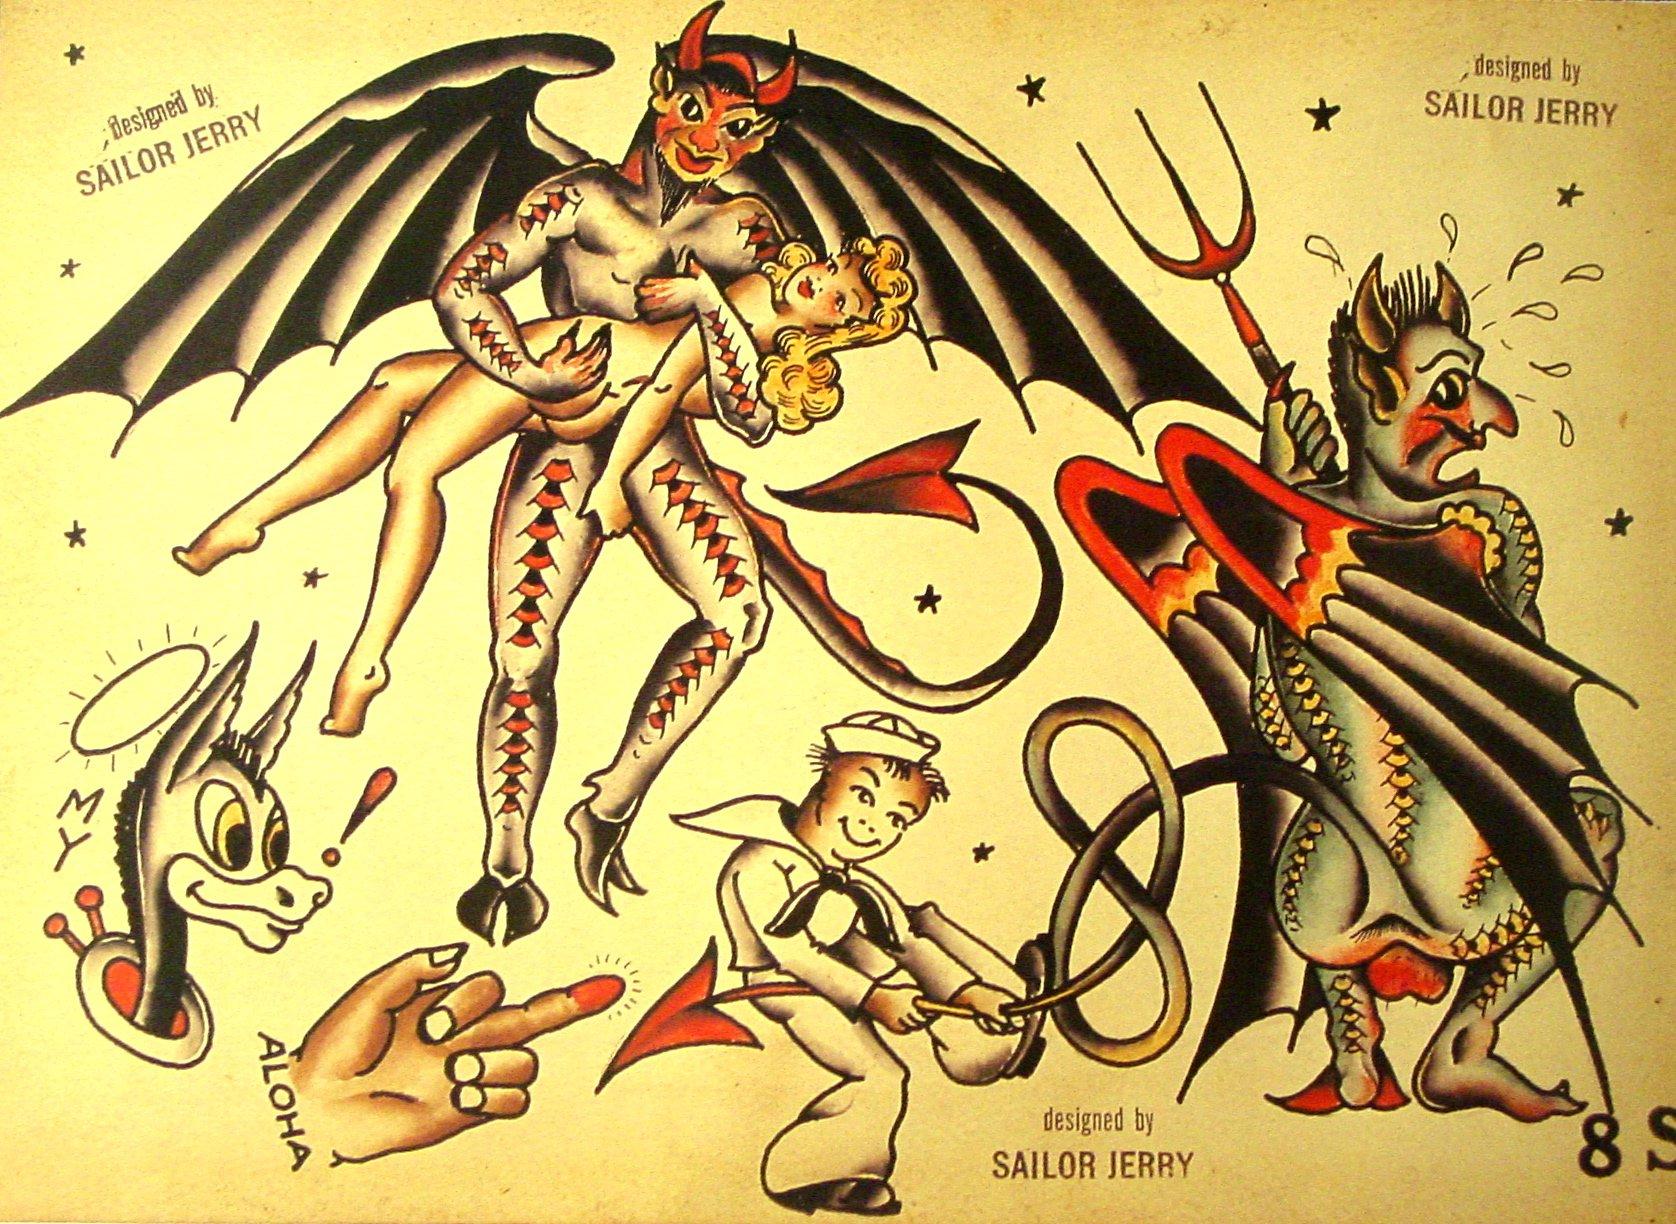 Sailor Jerry Tattoo Flash (10 Sheets): Butterflies, Devils, Pin-up ...